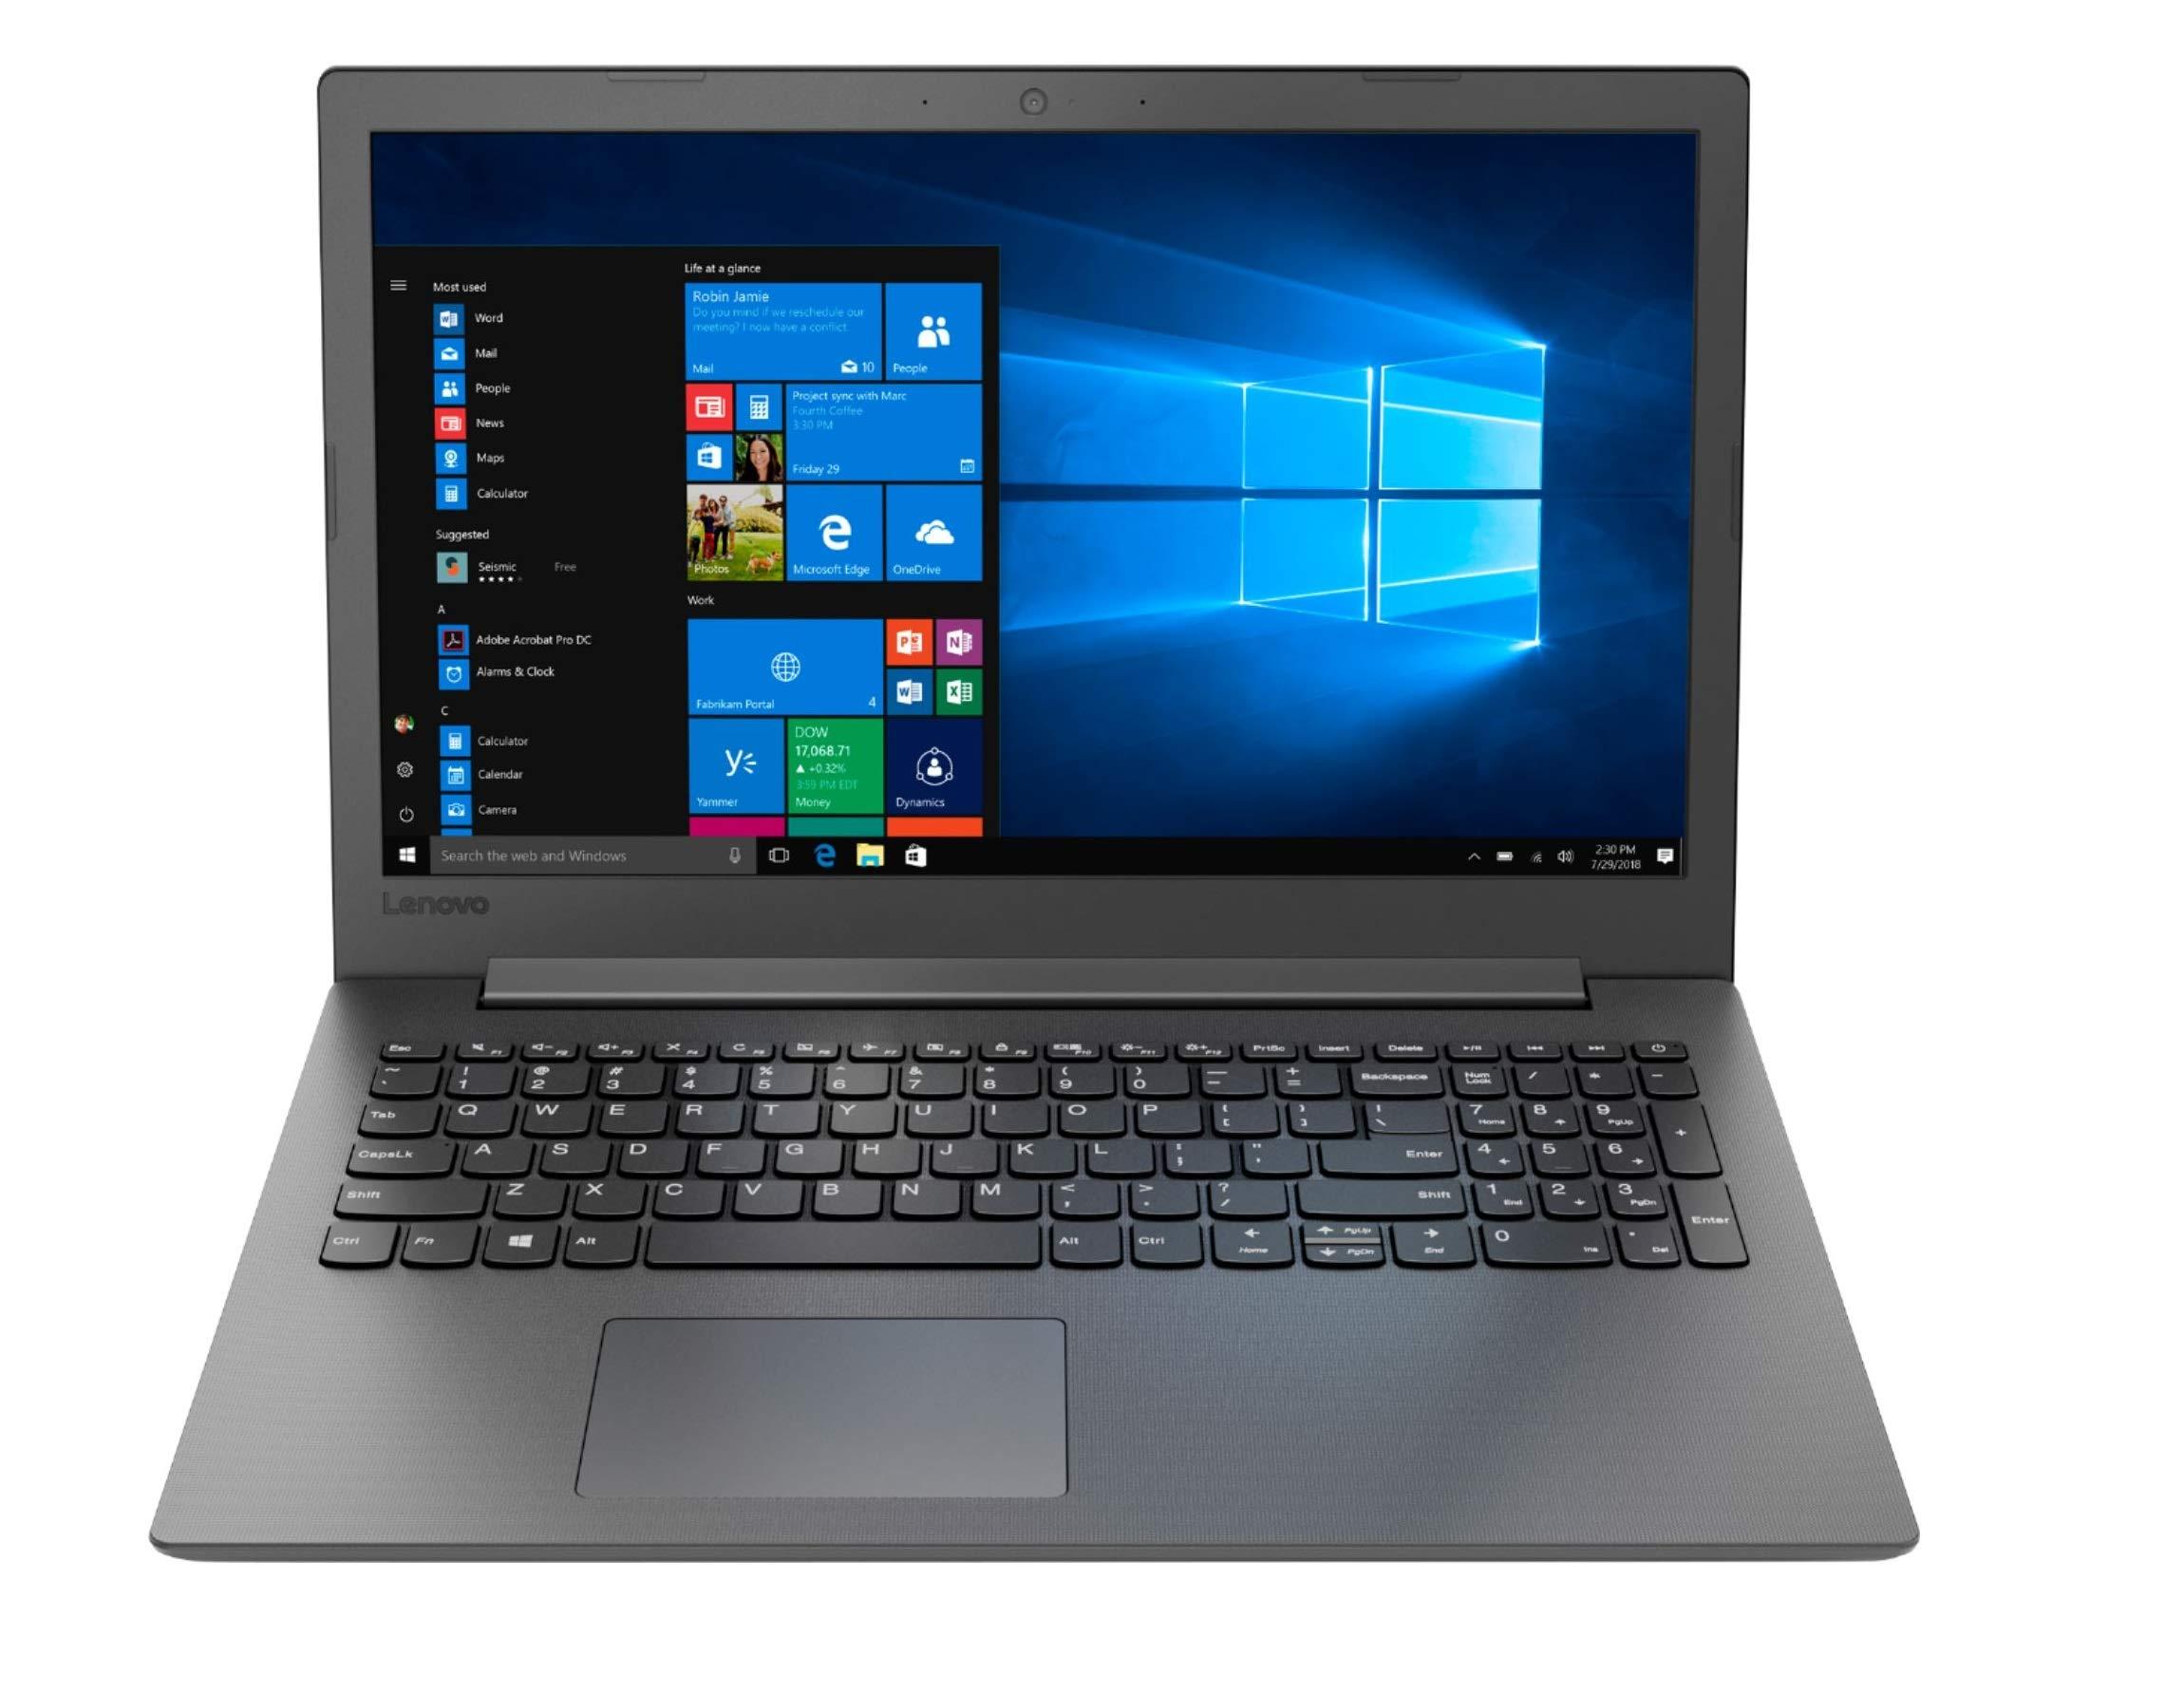 "Lenovo 130-15AST Home and Entertainment Laptop (AMD A9-9425 2-Core, 8GB RAM, 1TB SATA SSD, 15.6"" HD (1366x768), AMD Radeon R5, WiFi, Bluetooth, Webcam, 2xUSB 3.1, 1xHDMI, SD Card, Win 10 Pro)"